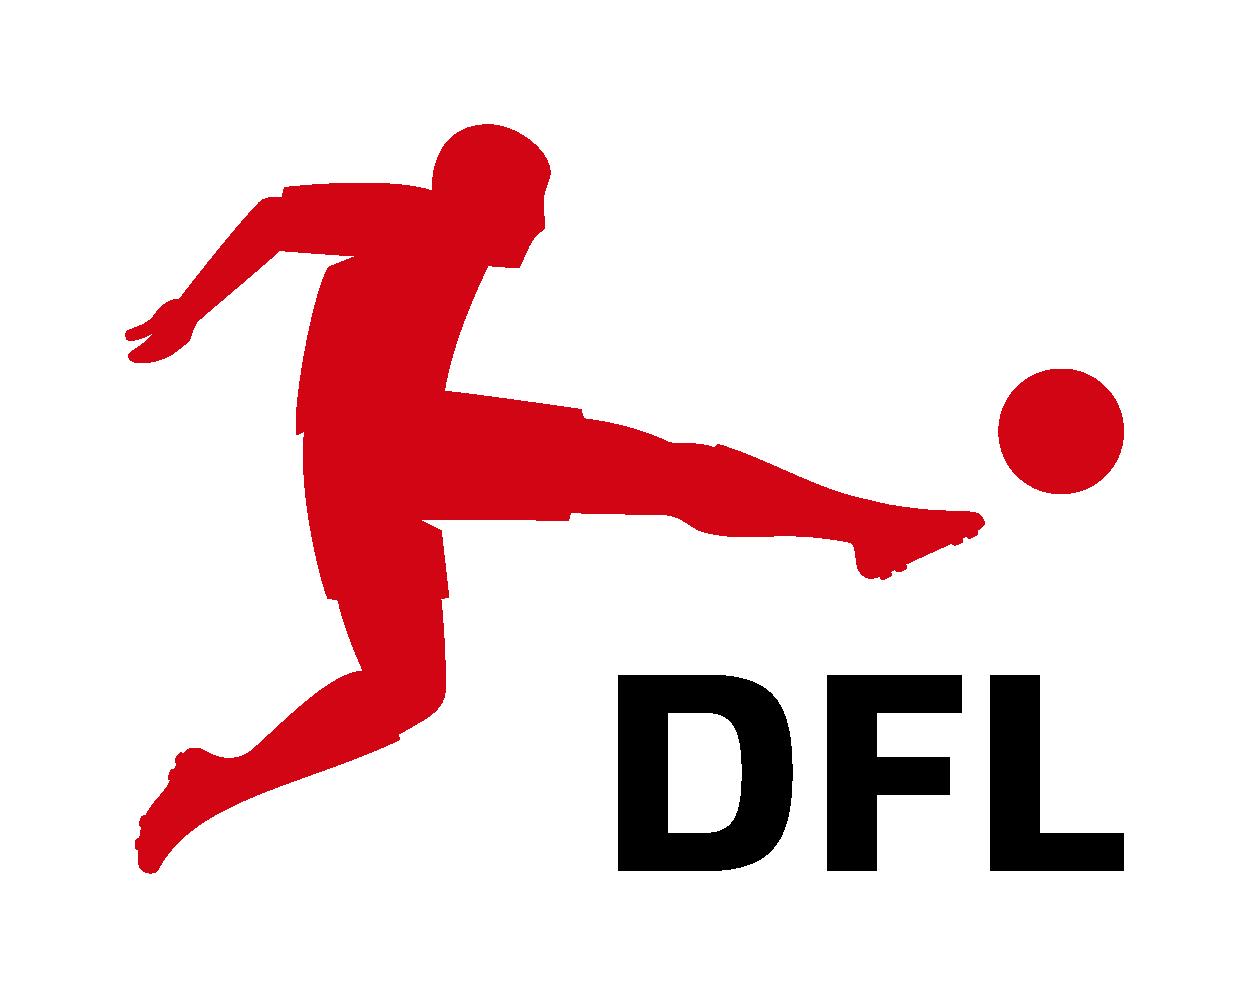 Dfl Deutsche FuГџball Liga Gmbh